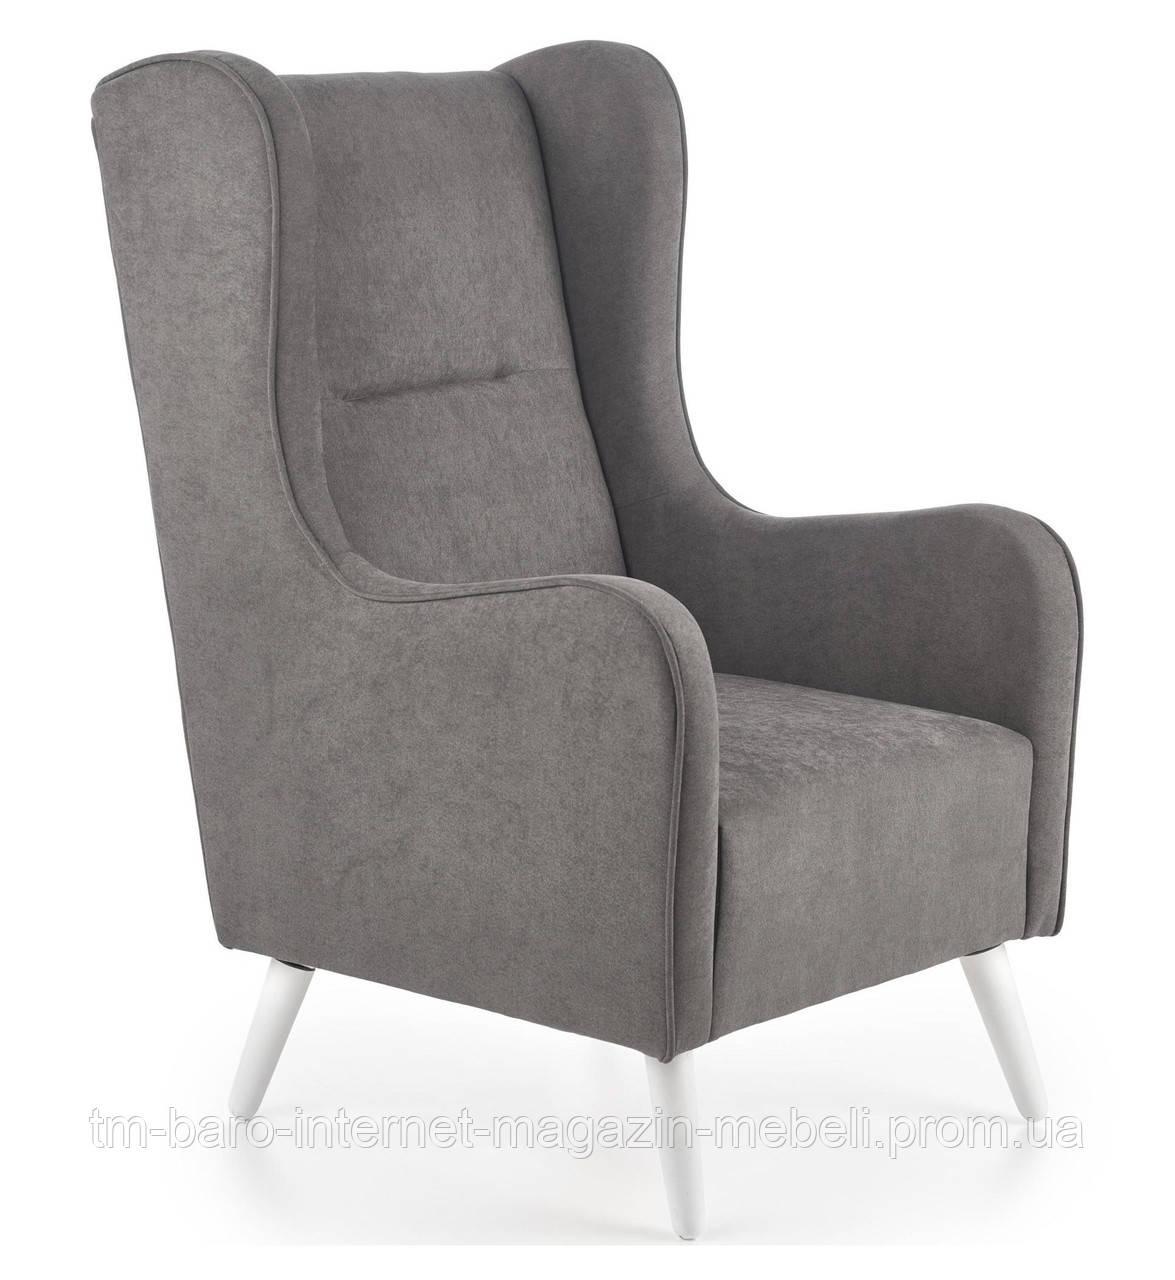 Кресло Chester (Честер) темно-серый, ткань, Halmar